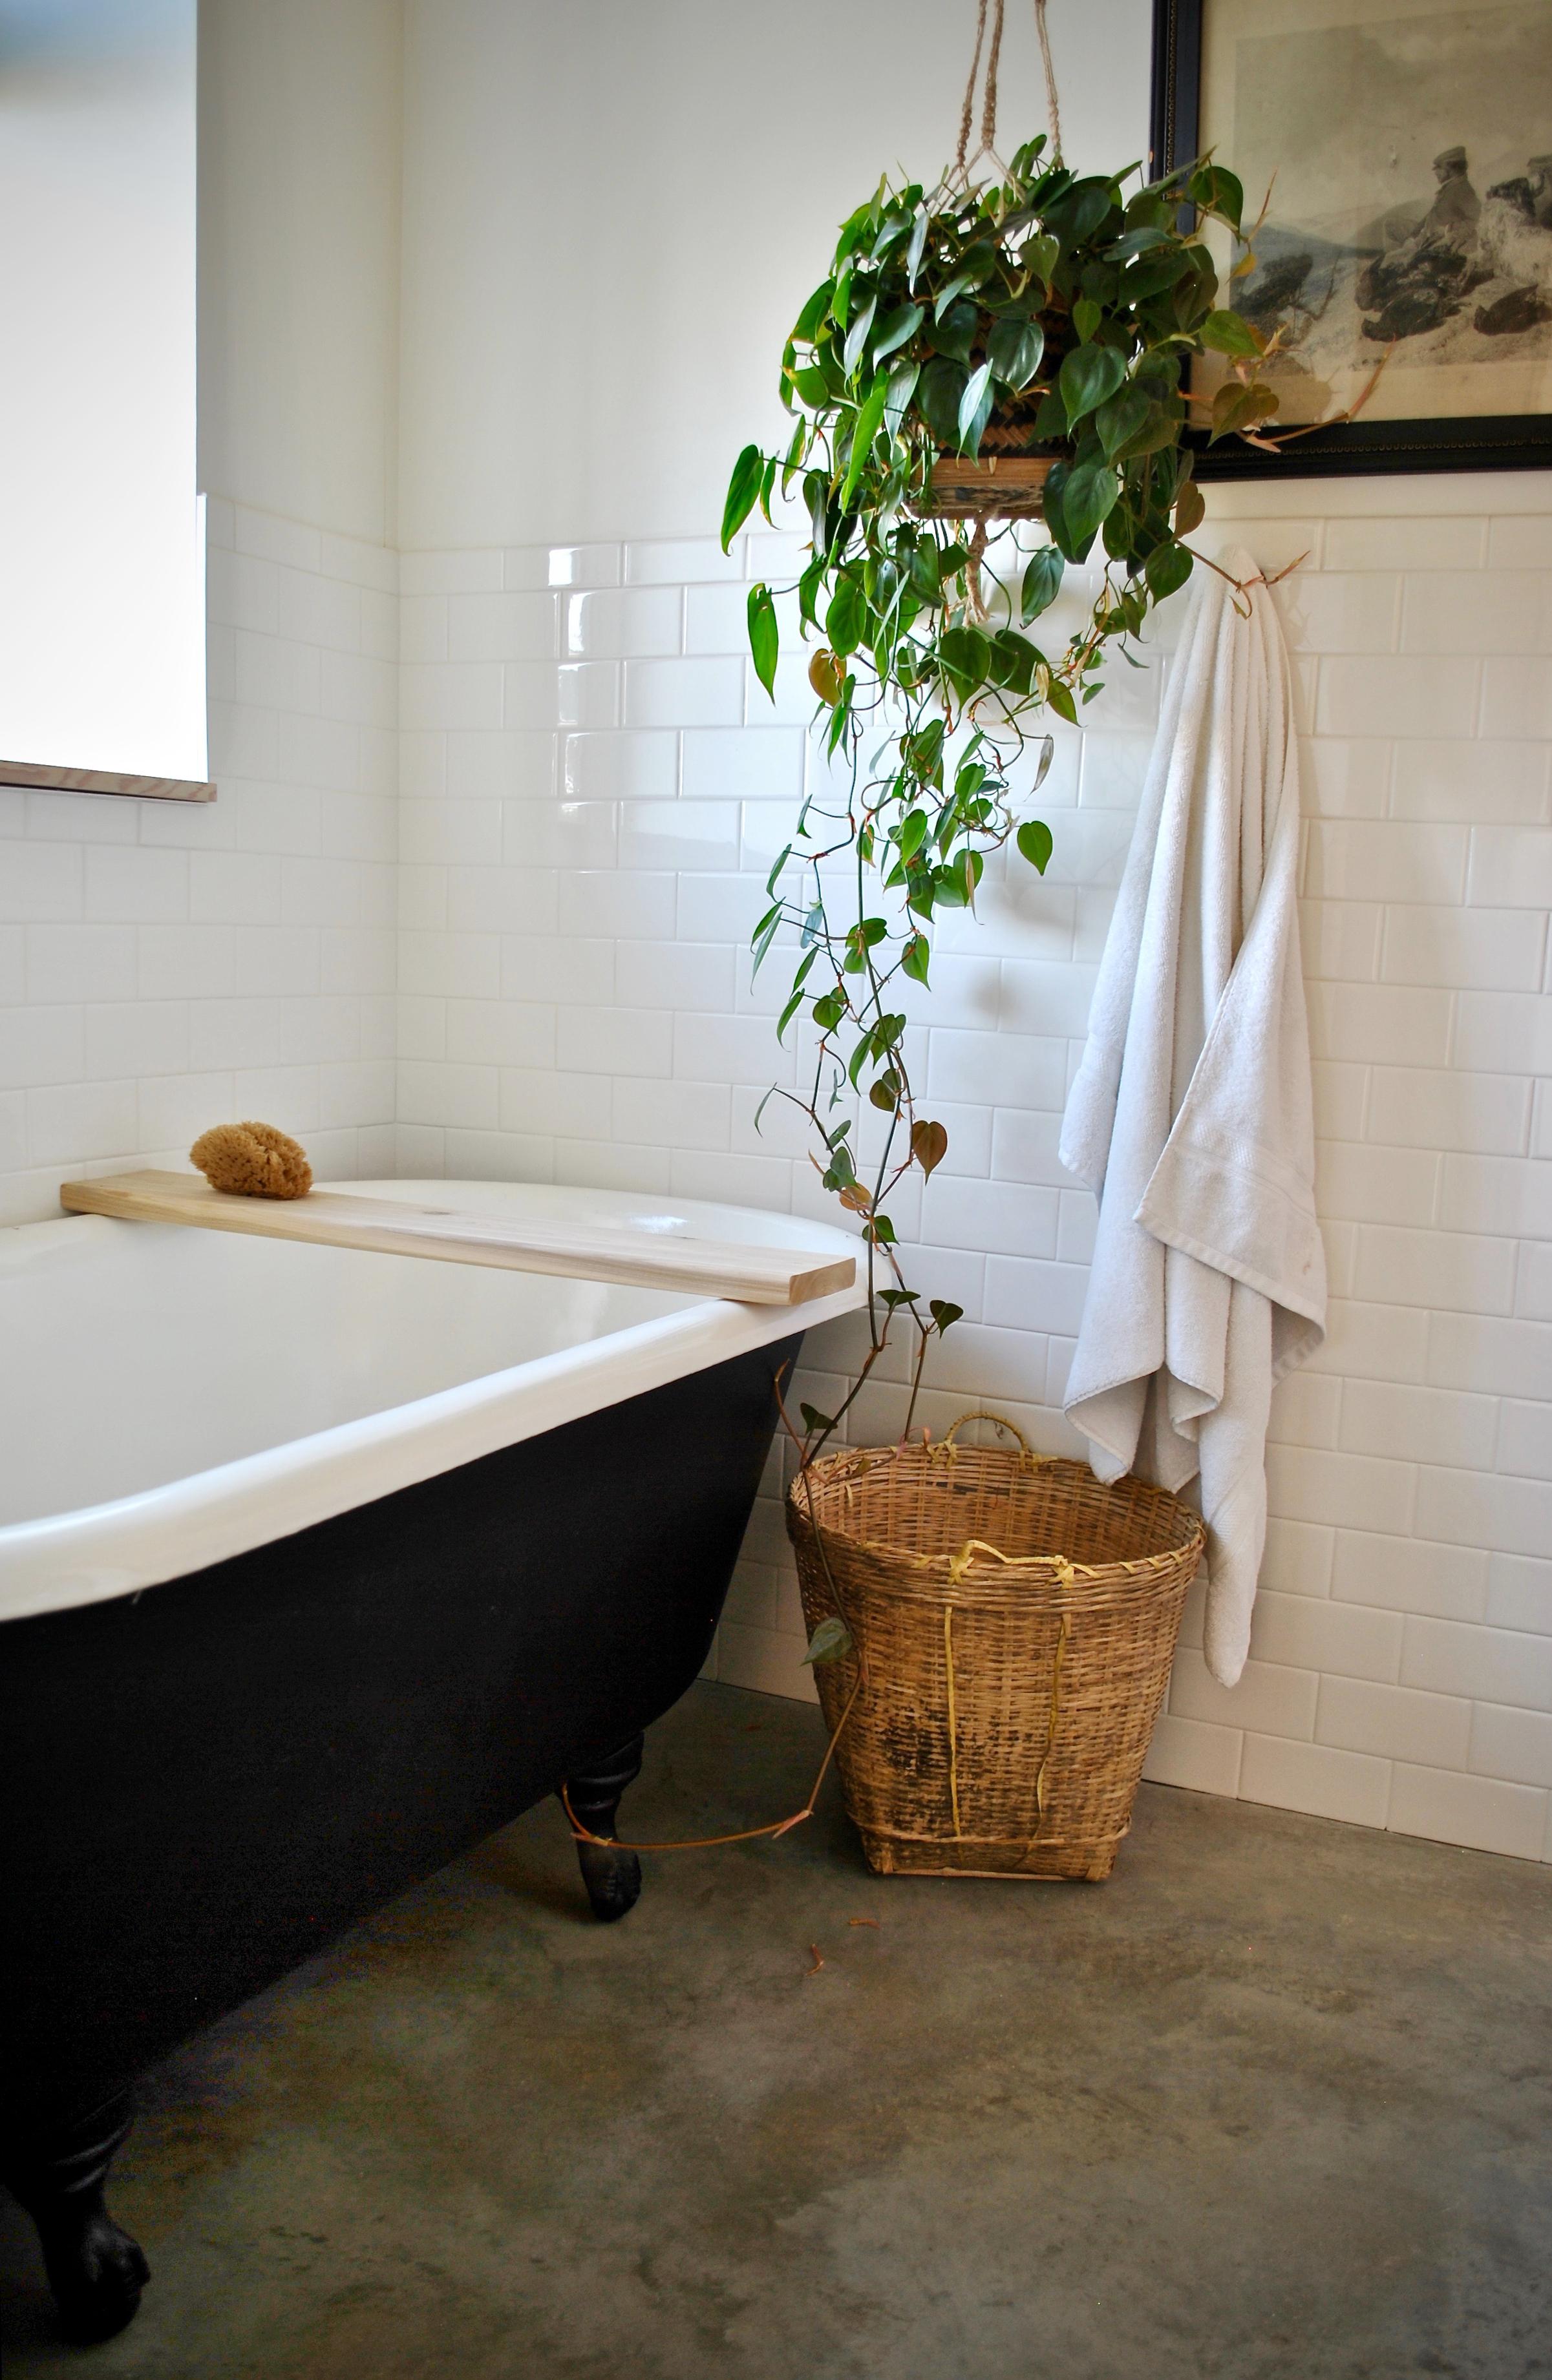 earle bath 3(b).jpg